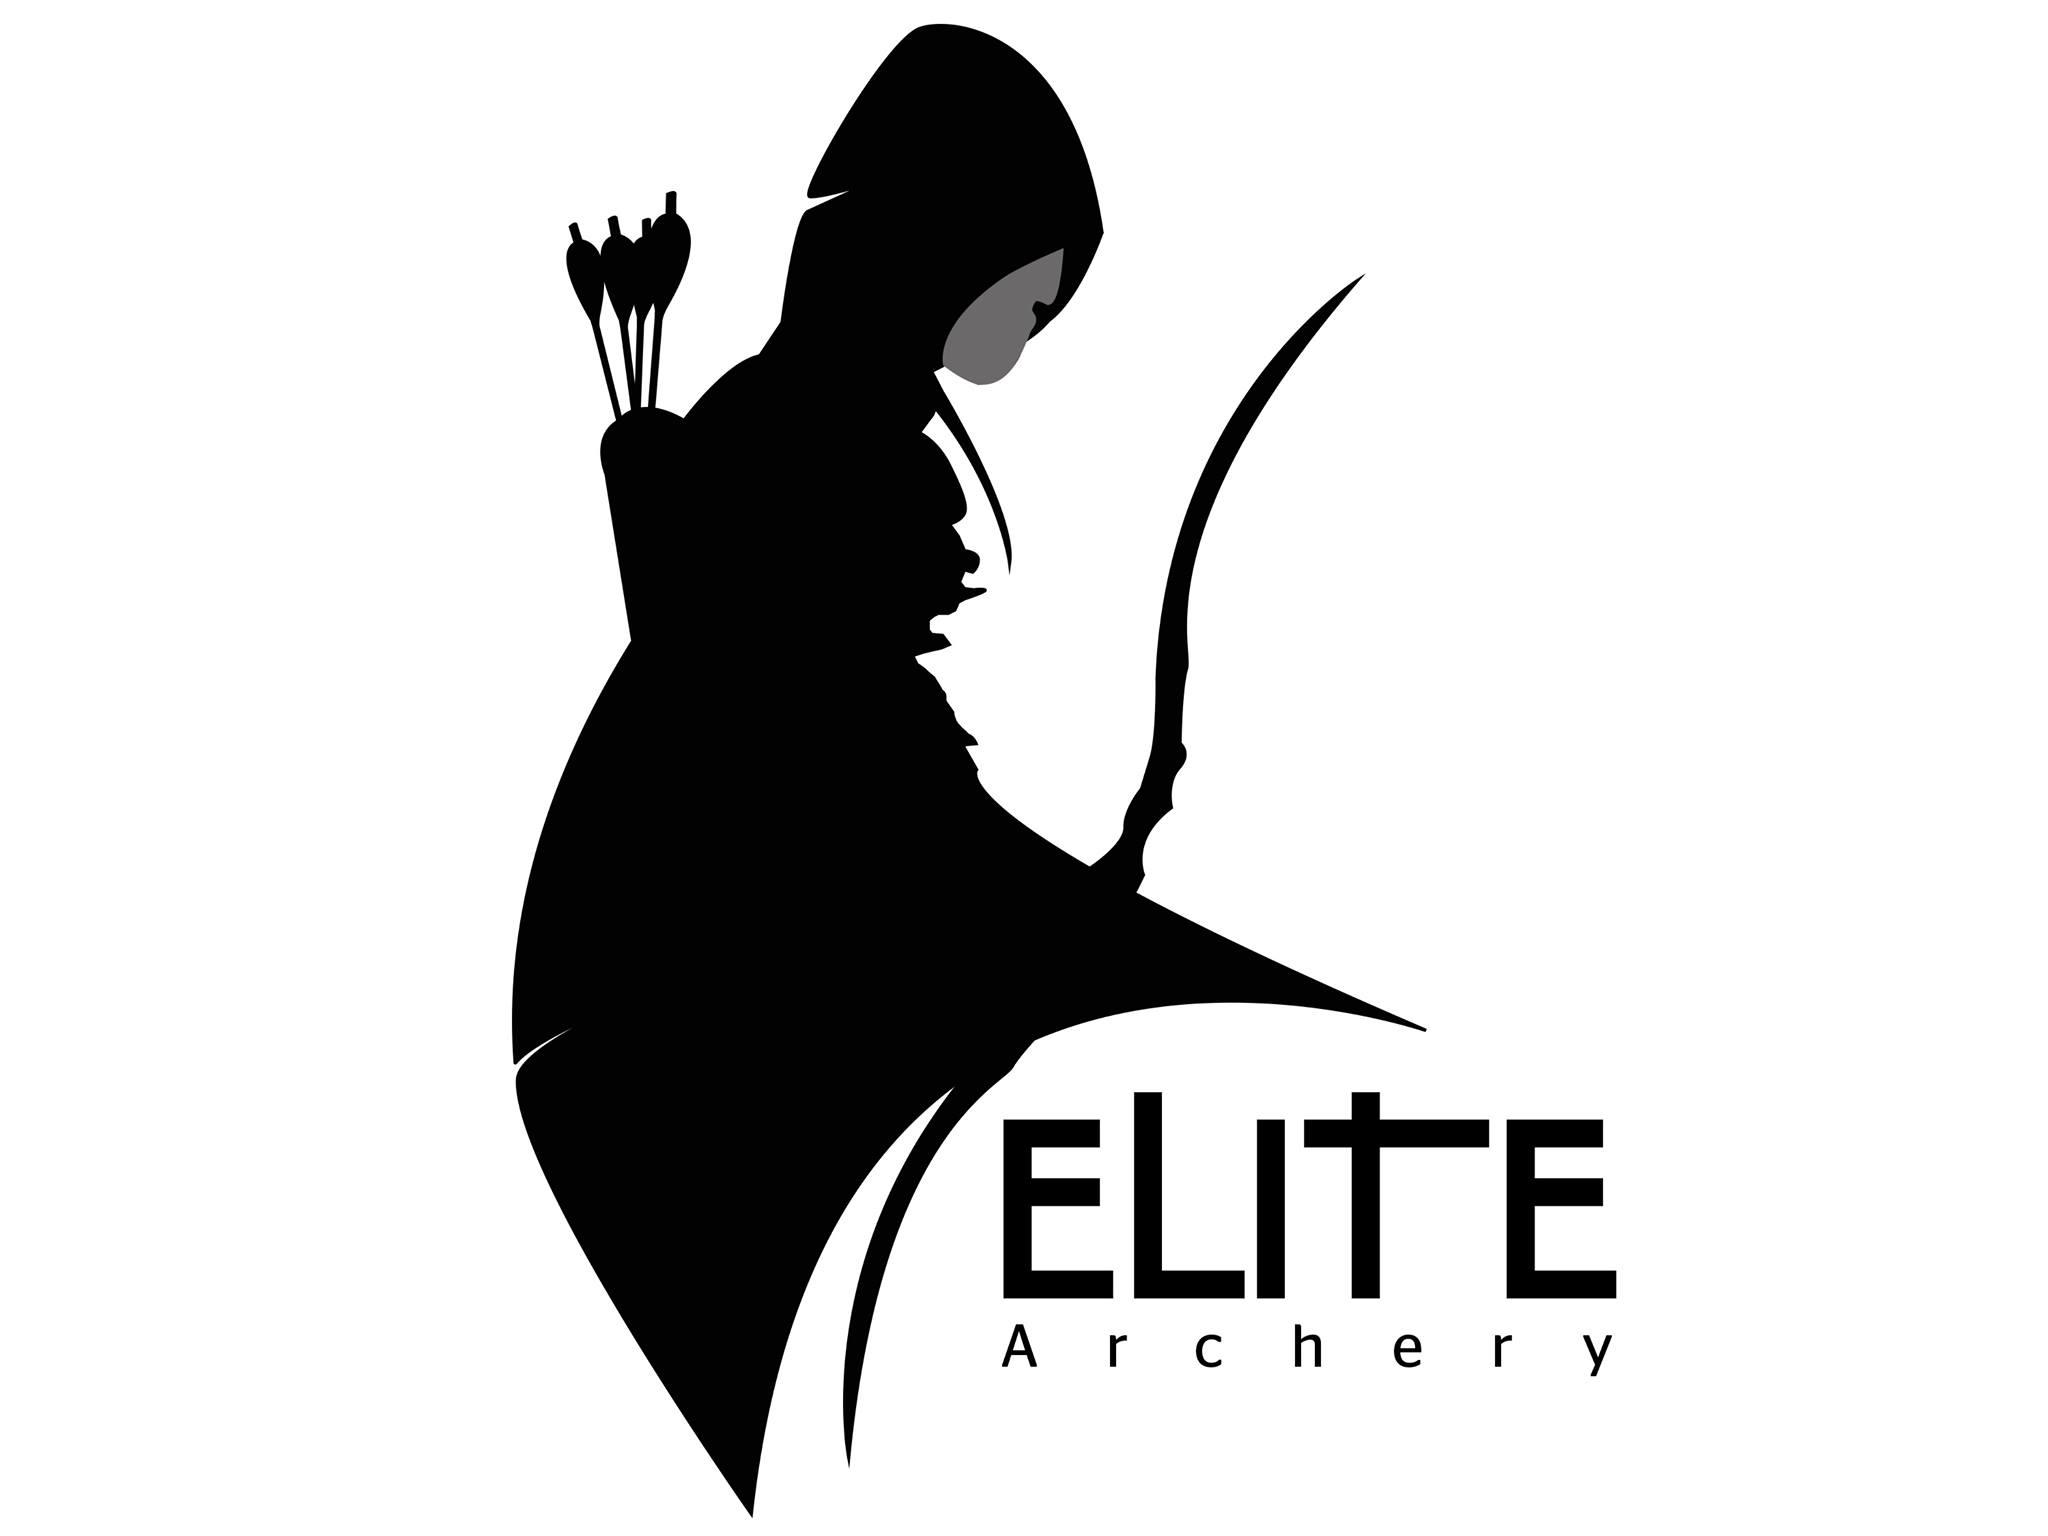 Elite Archery Logo 2048x1536